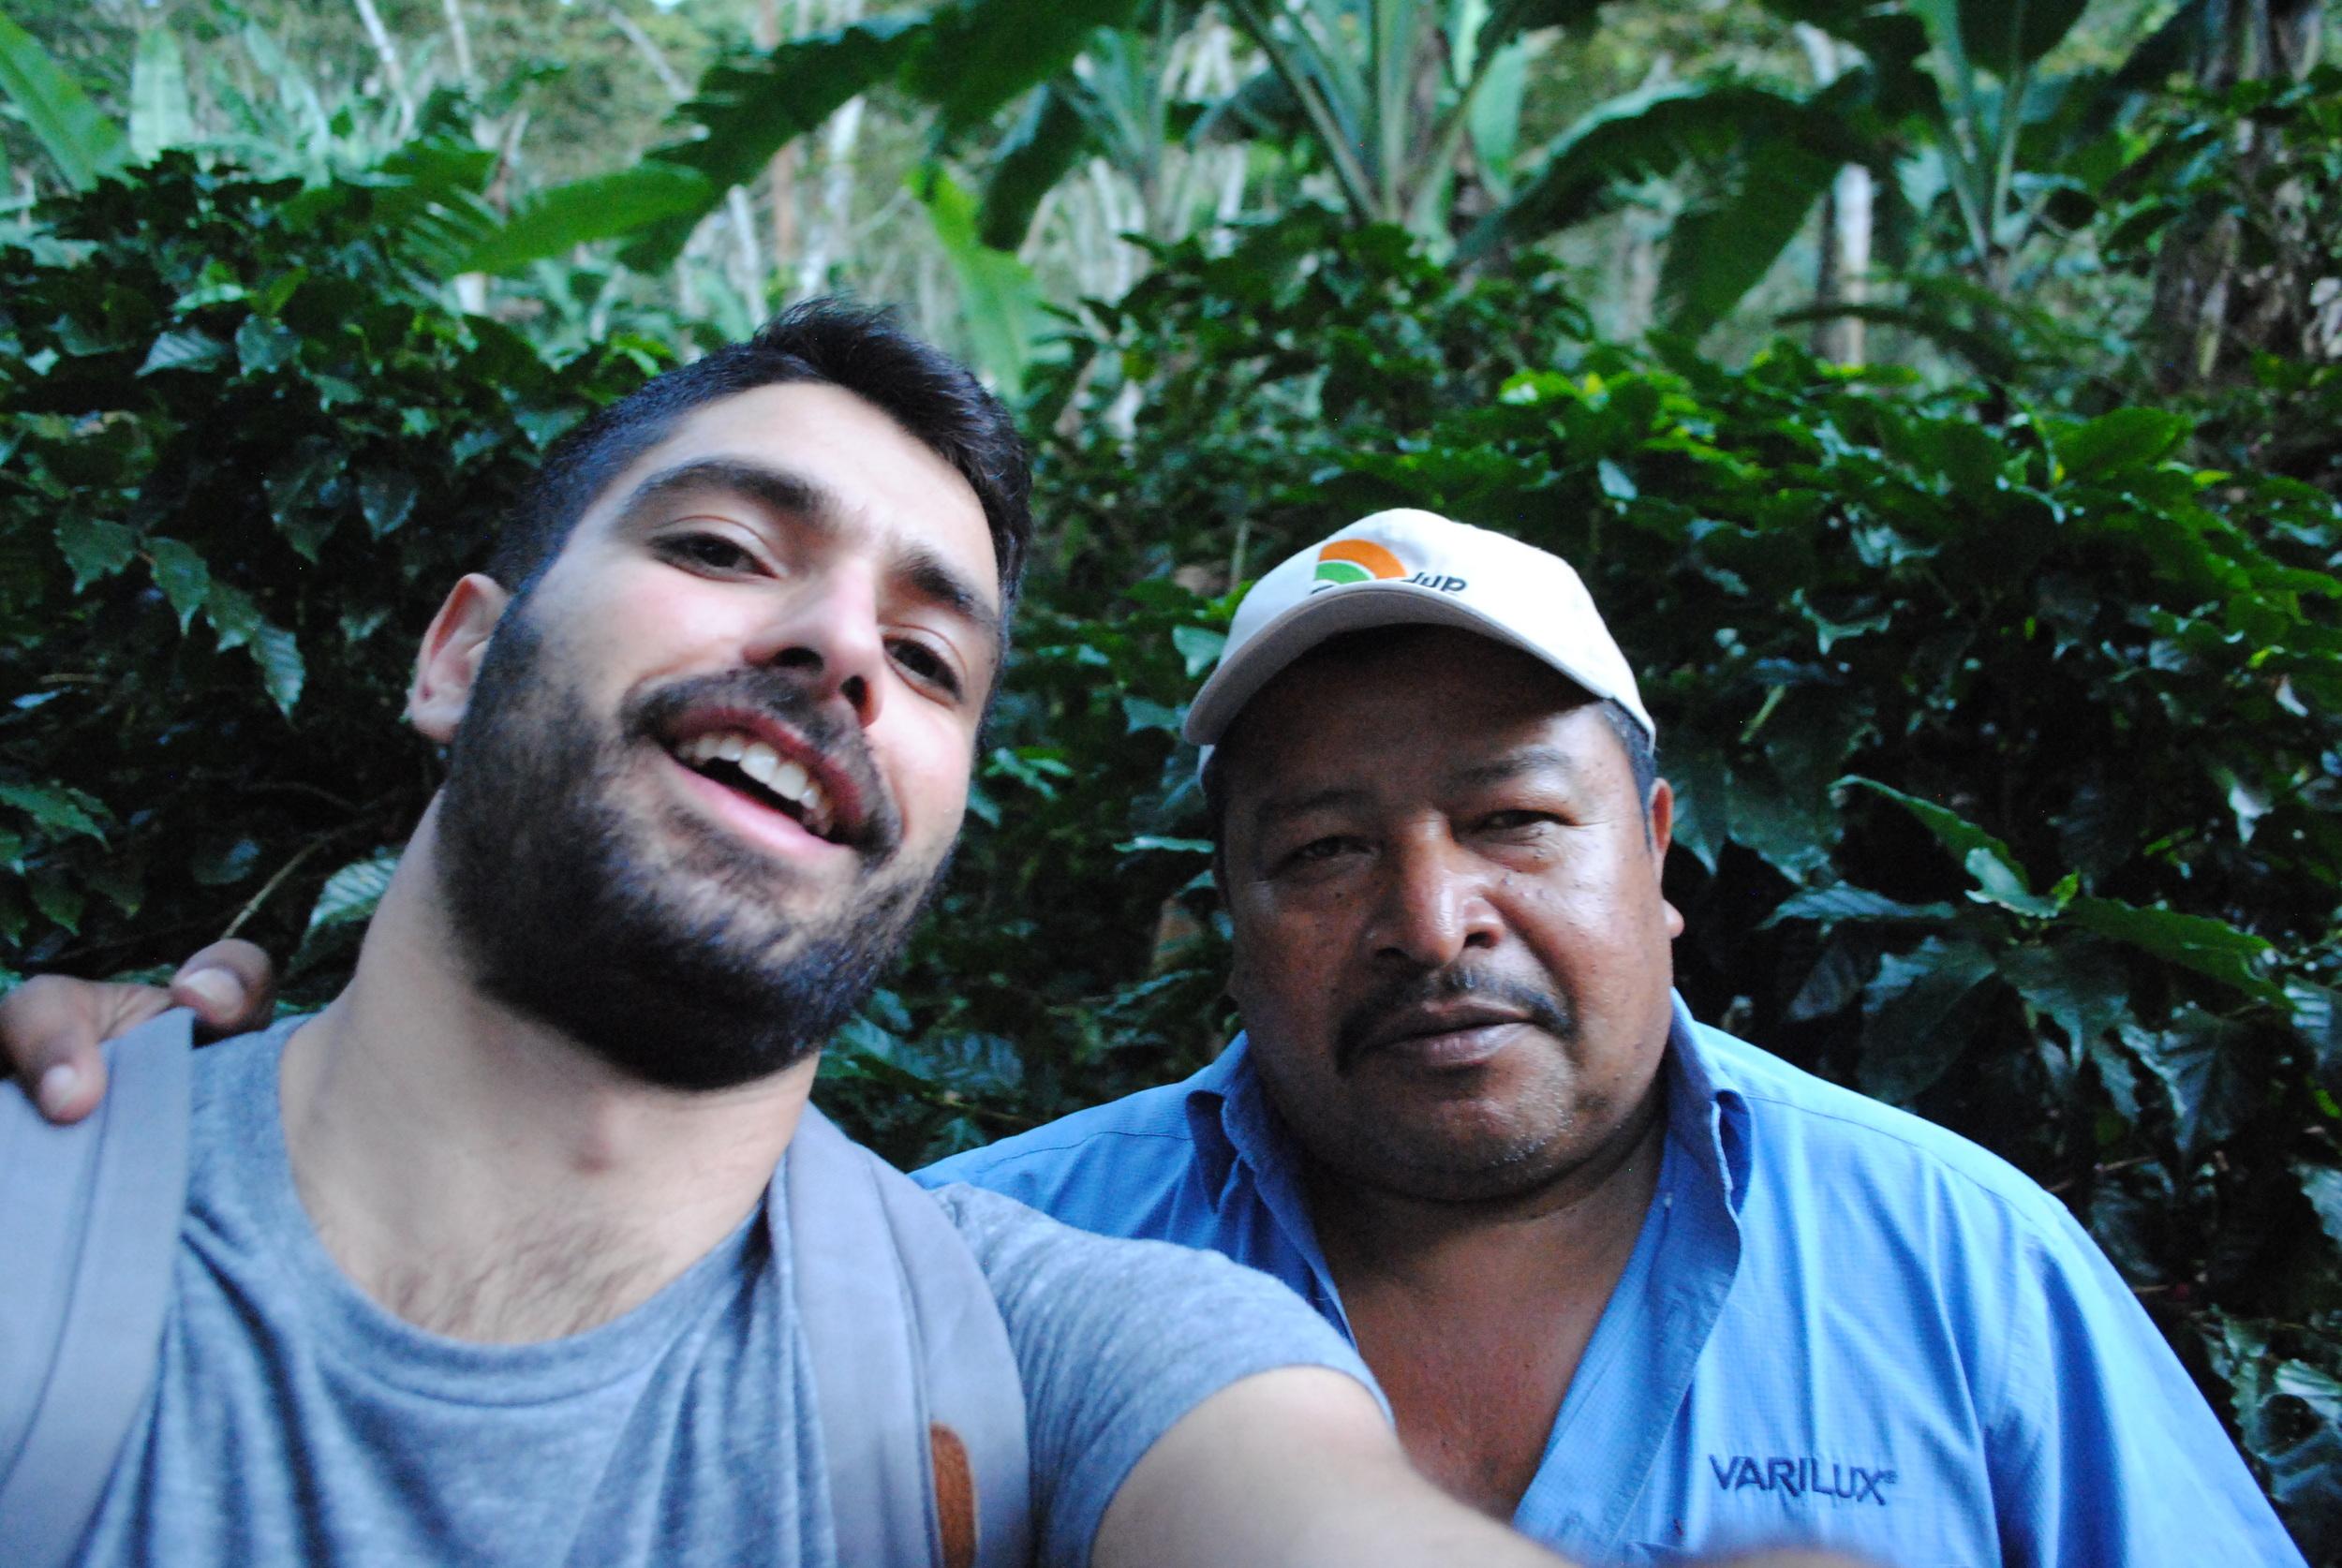 Rayy and Danilo